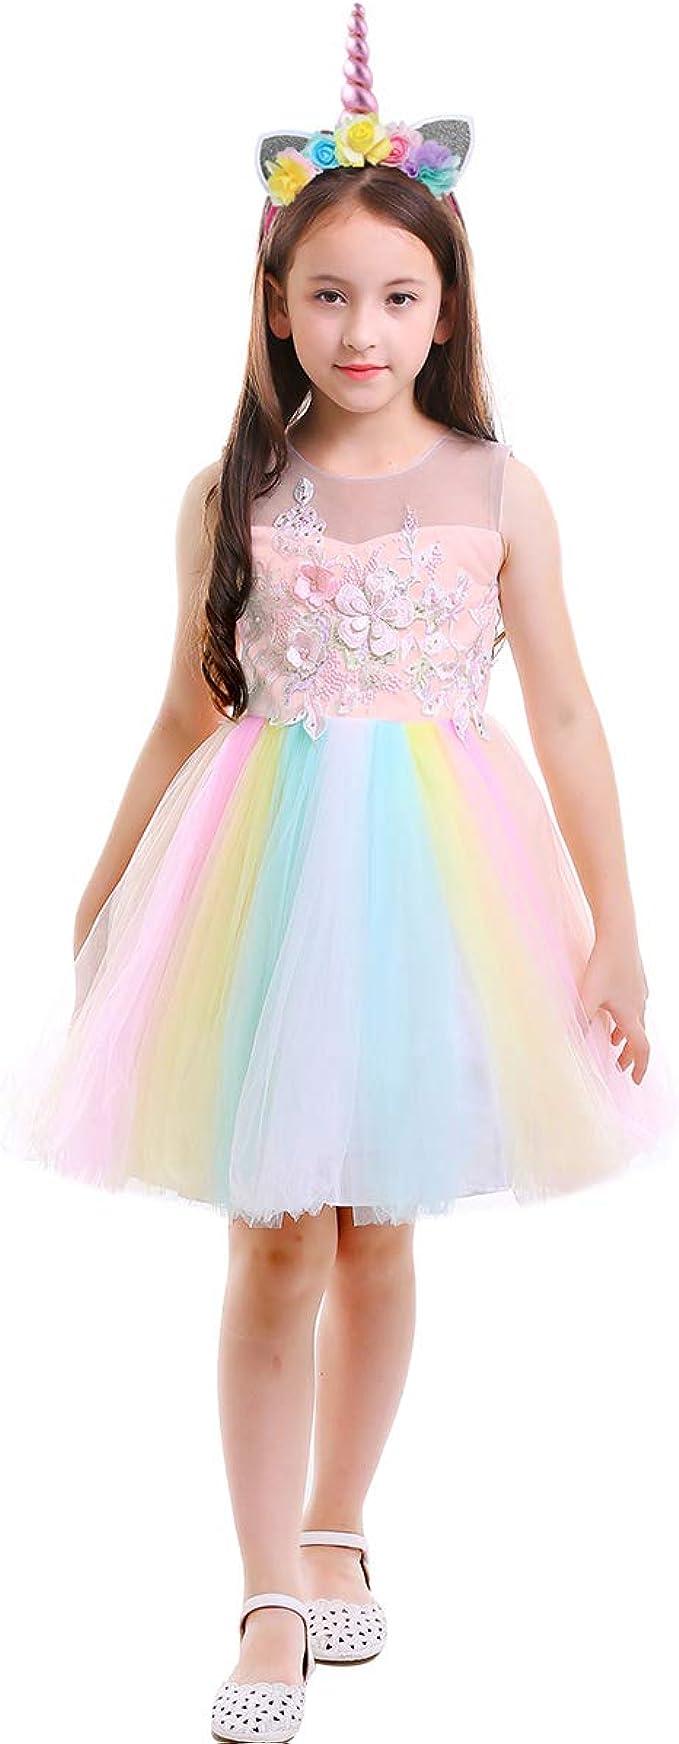 Flower Girl Dress Fairy Wings Sequin Hem Flower Girl Rainbow Costume Wedding Butterfly Wings Rainbow Tutu Fairy Dress Sequin Dress